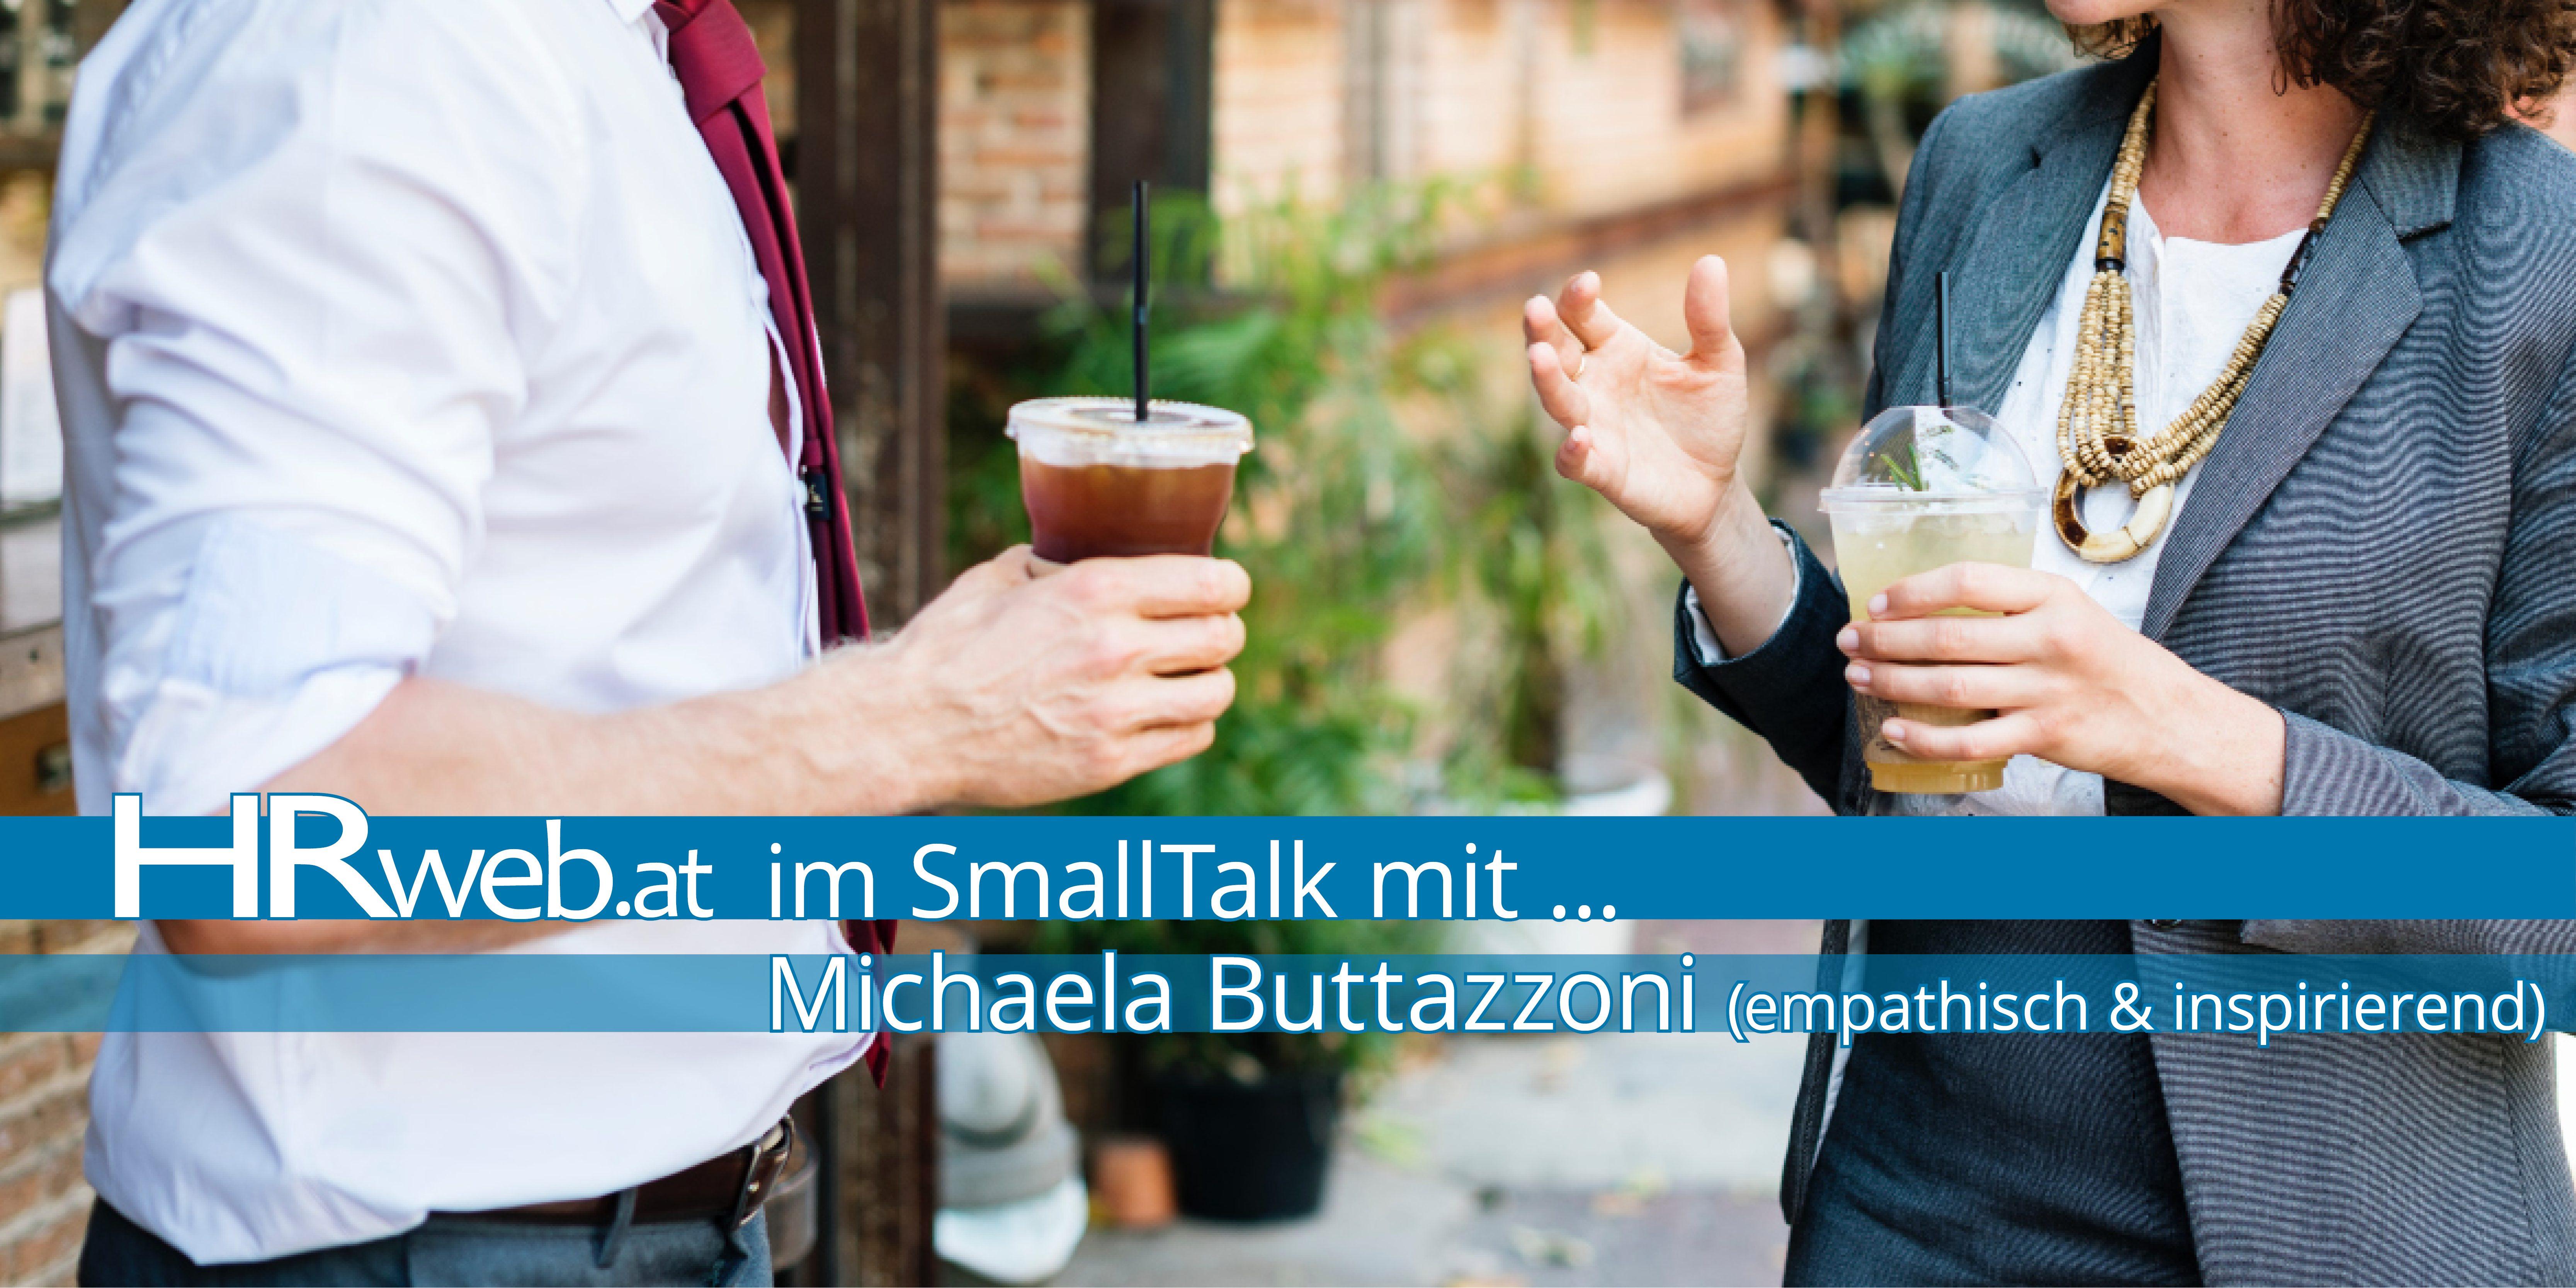 Michaela Buttazzoni, BDO